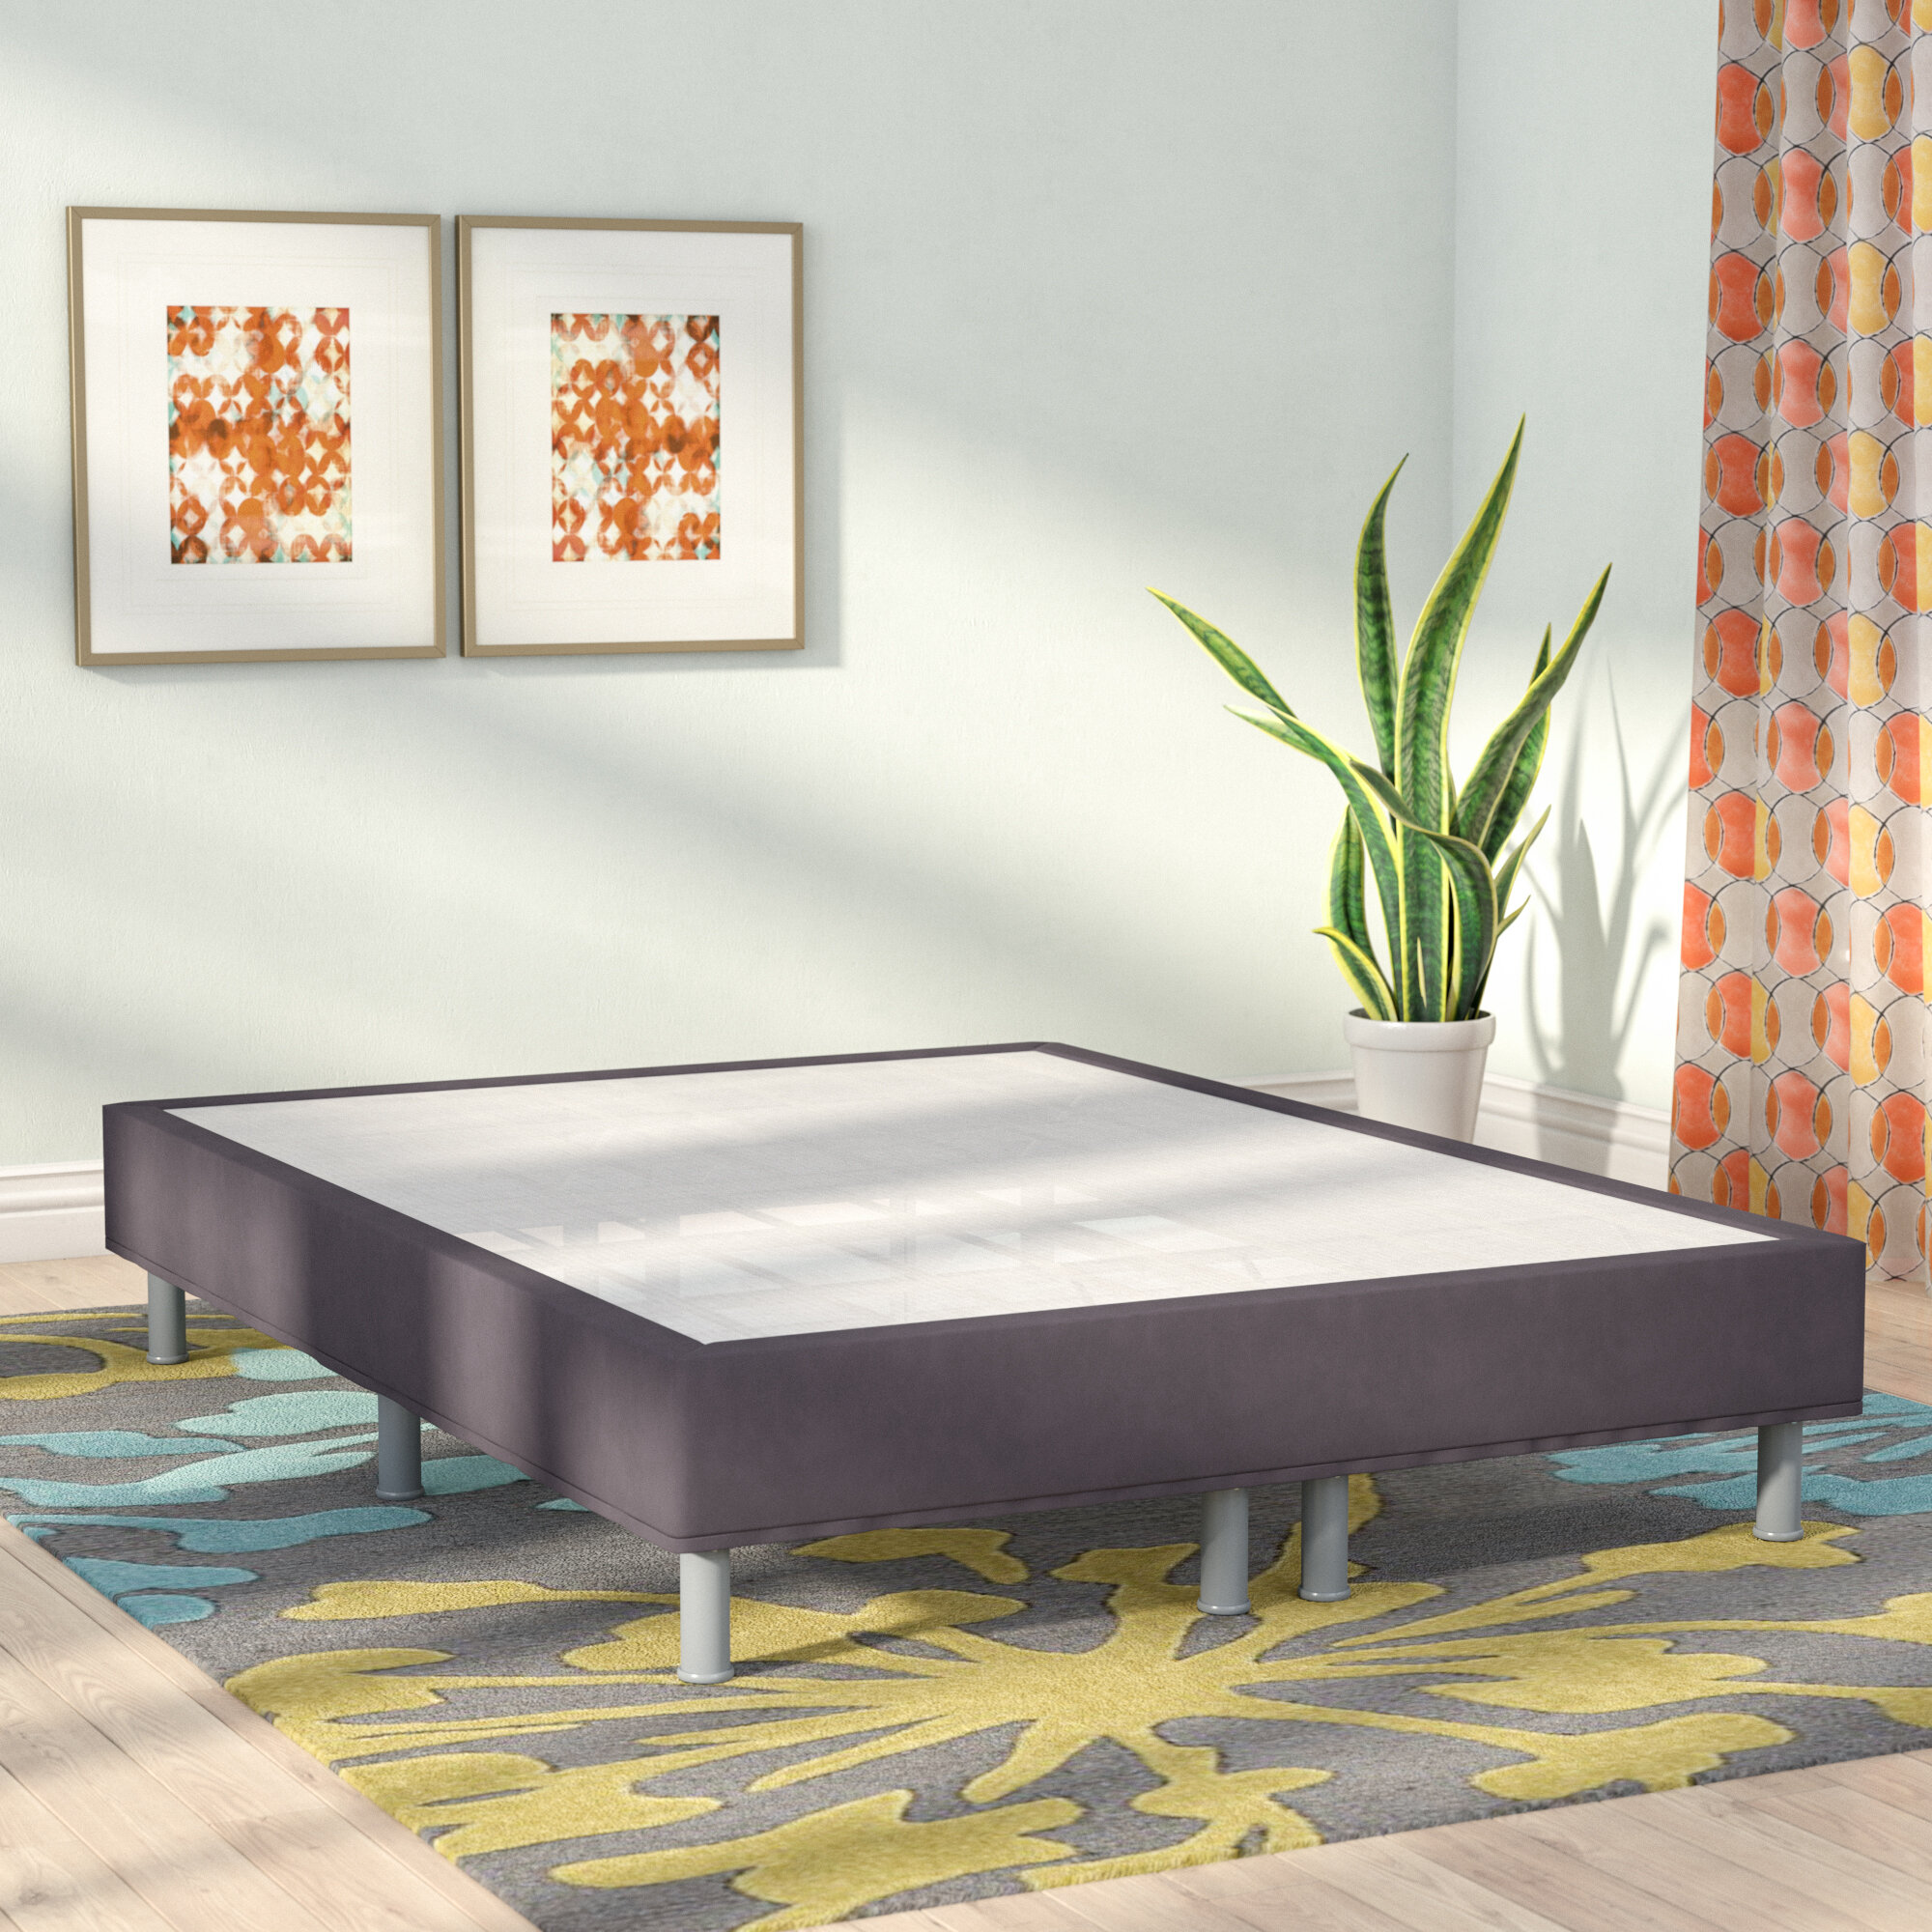 heavy multiple person memory for foam com ip homedics sizes mattress walmart